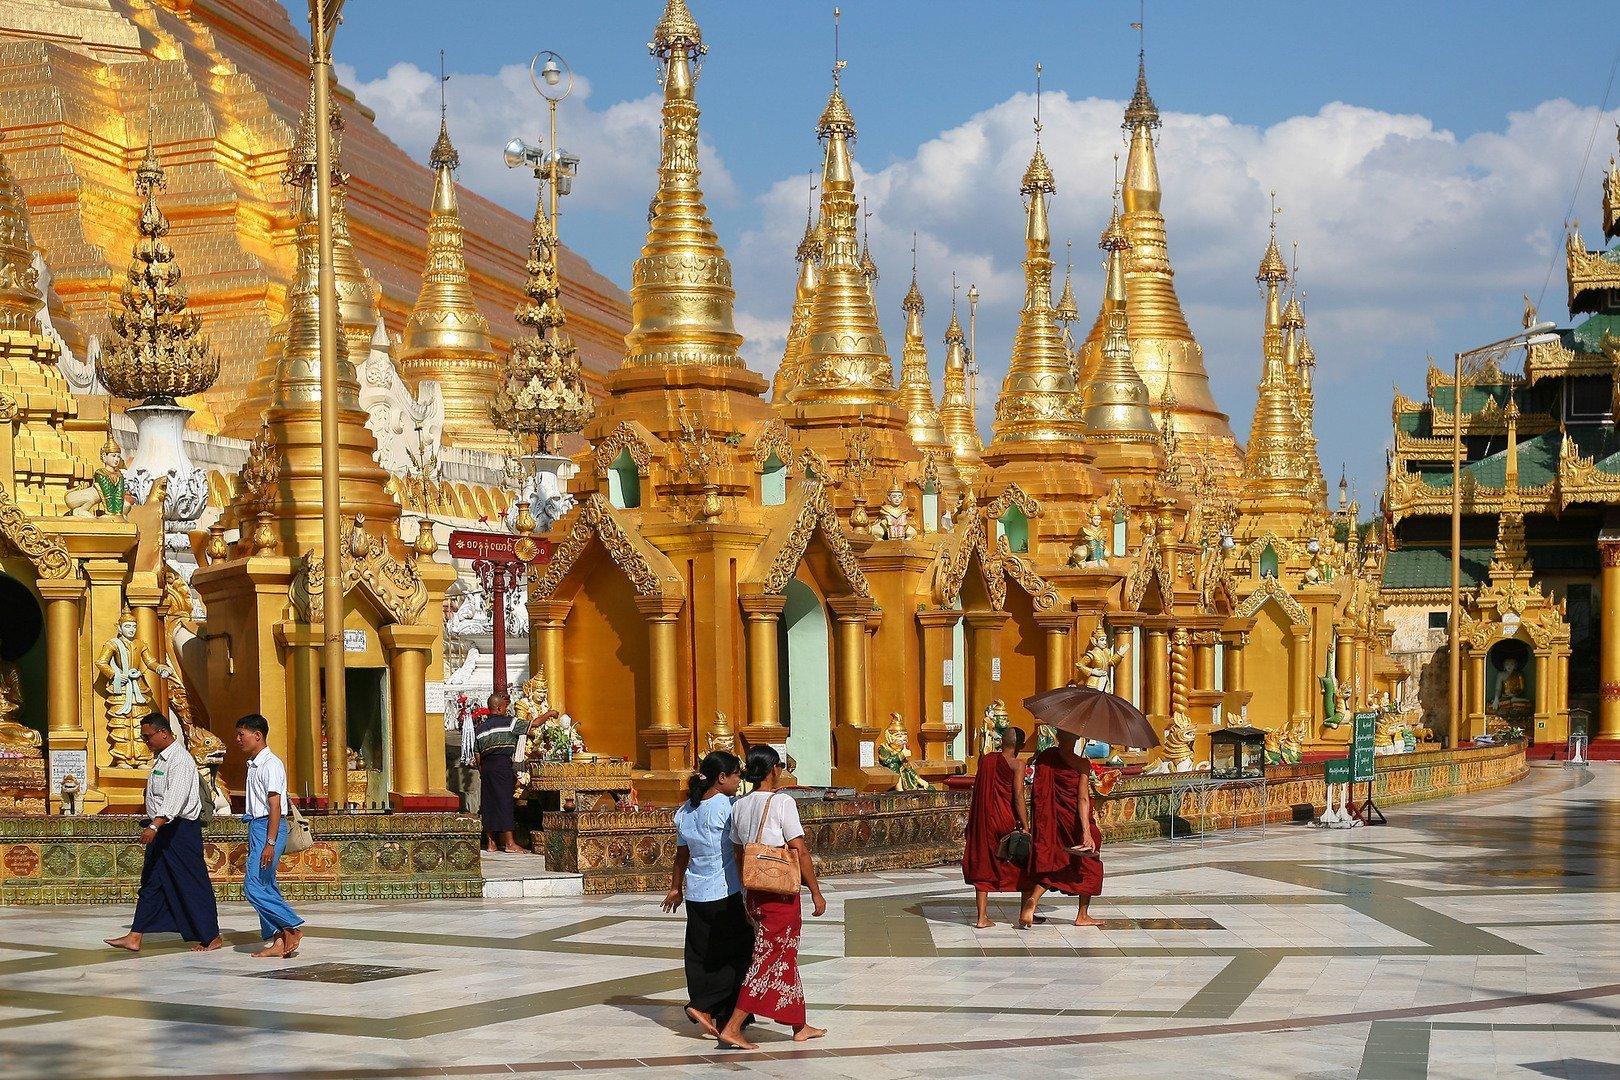 MYANMAR - ACAMM2015.COM